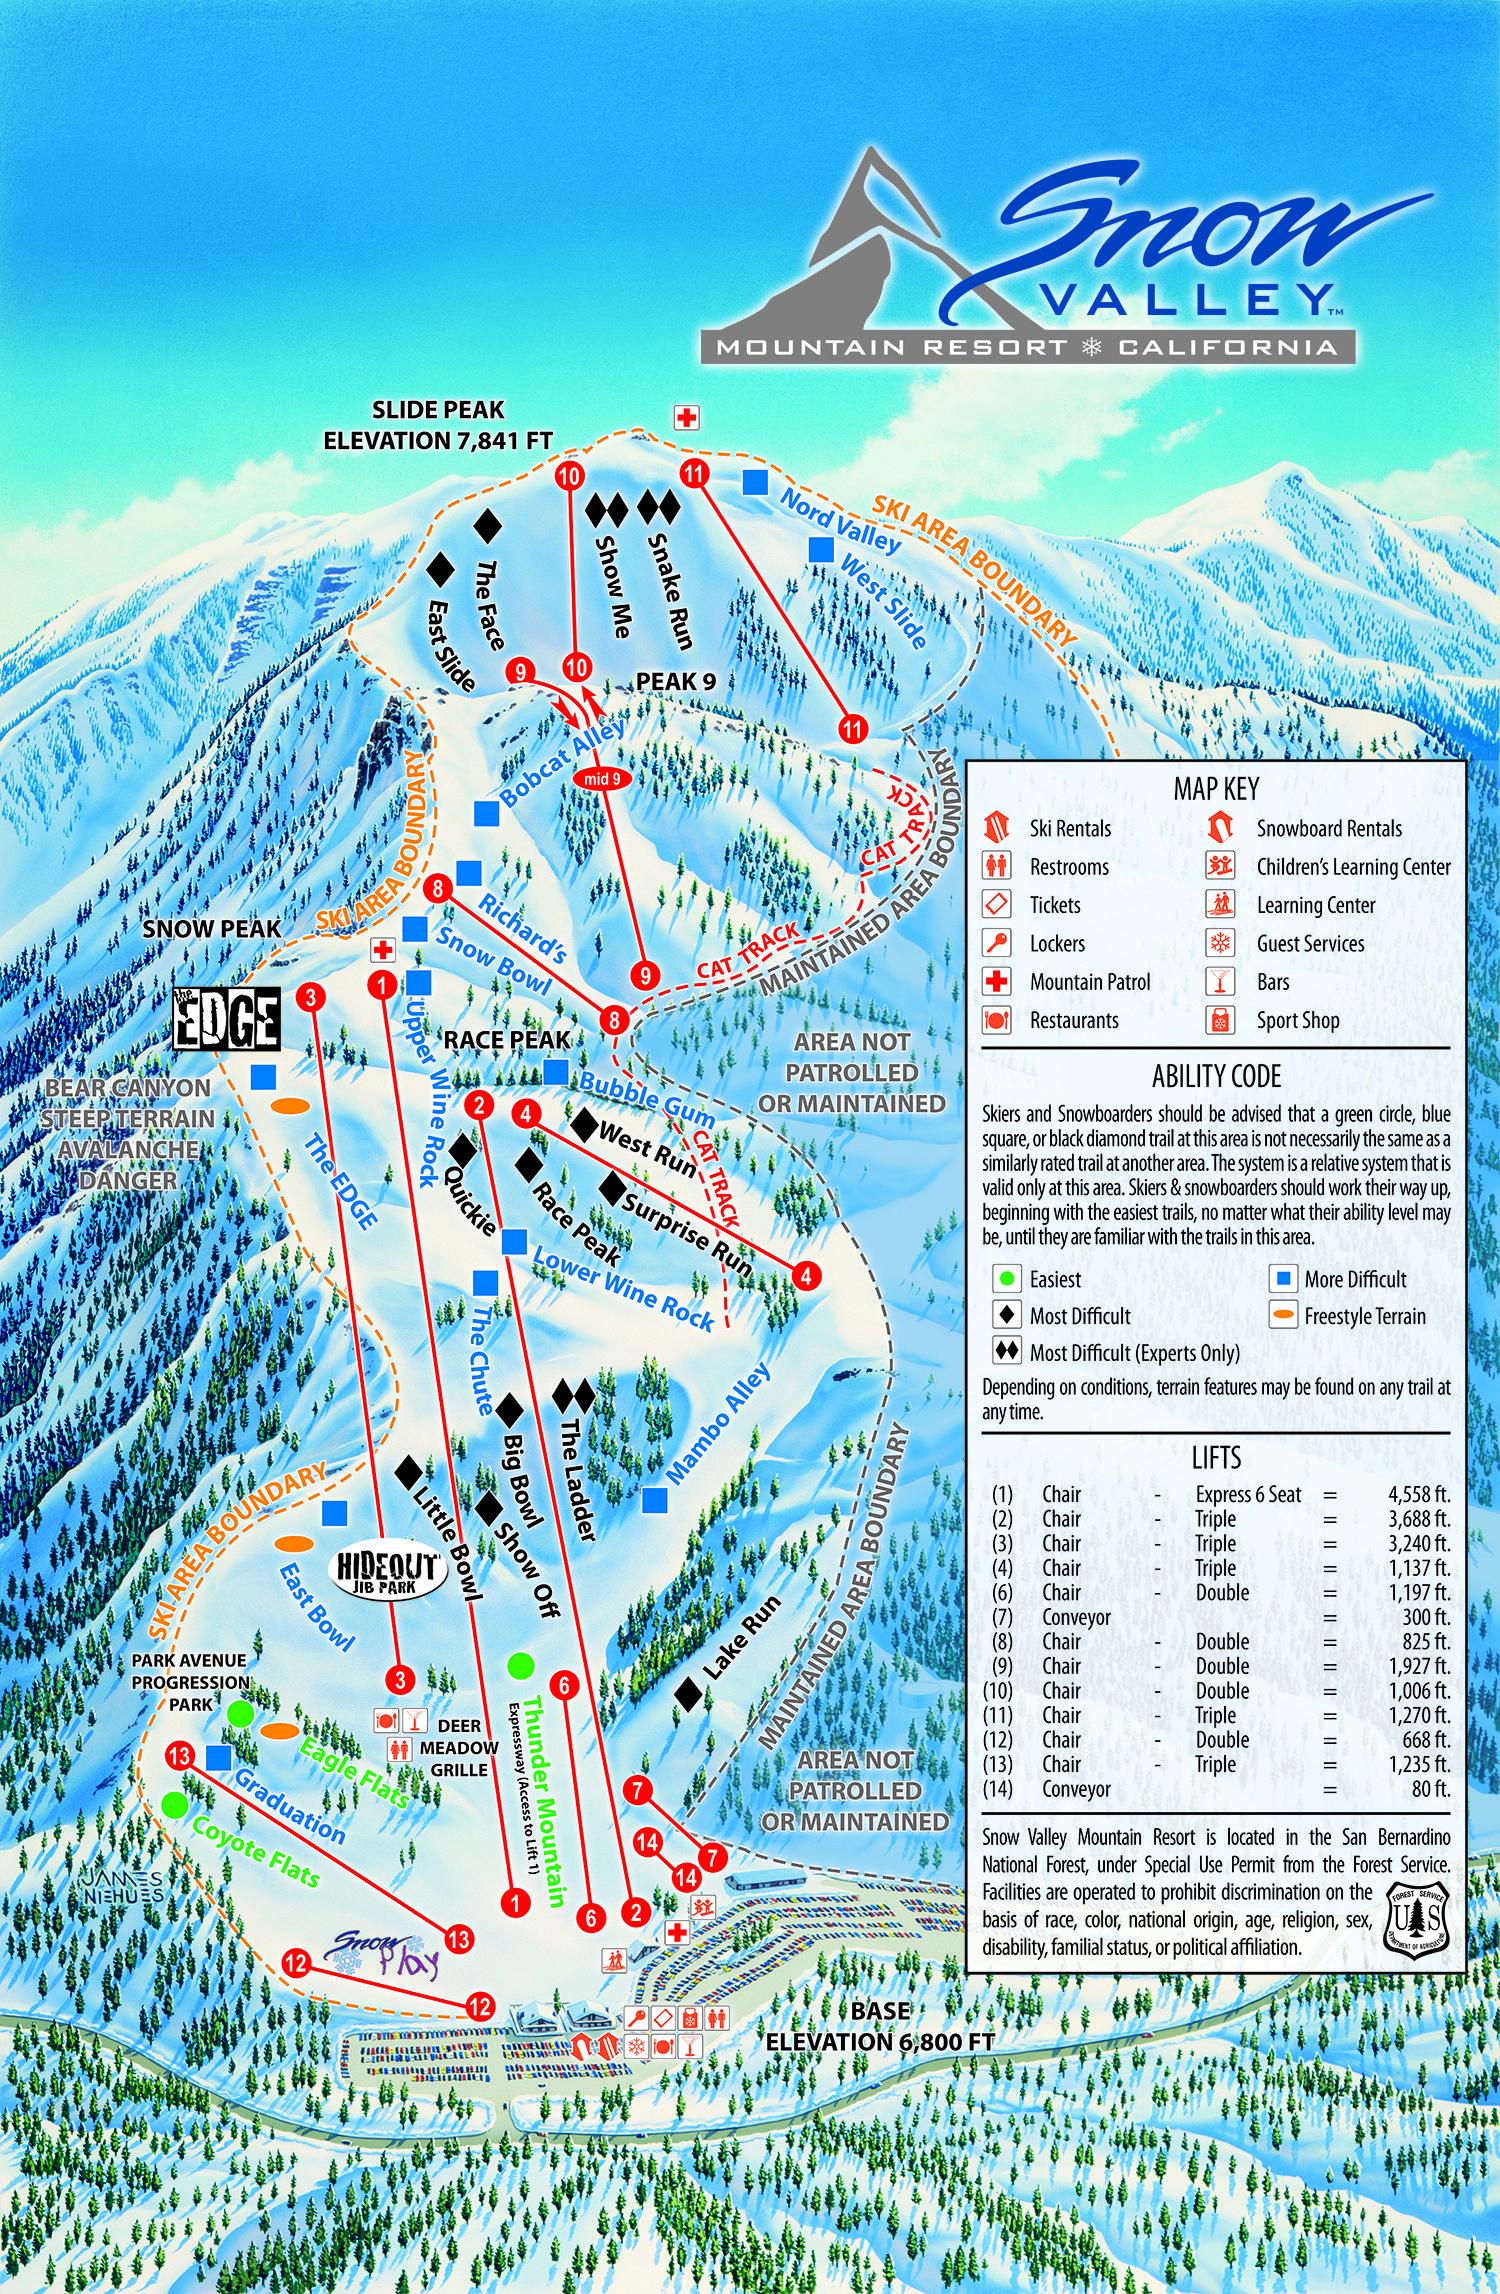 Snow Valley Mountain Resort - Ski & Snowboard | All About Lake